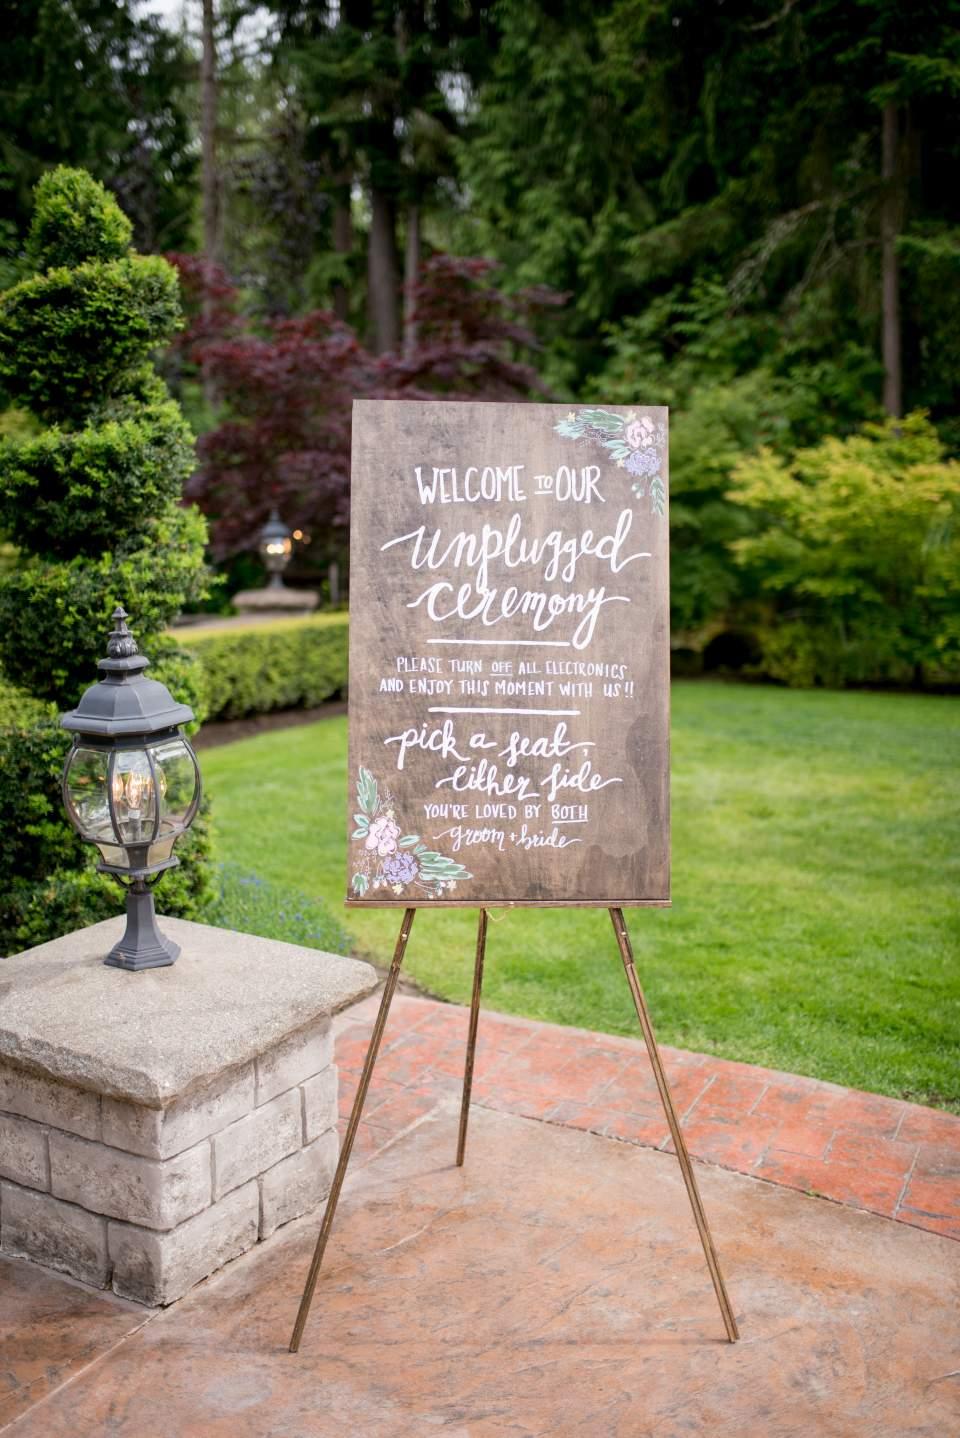 unplugged ceremony sign at rock creek gardens wedding venue